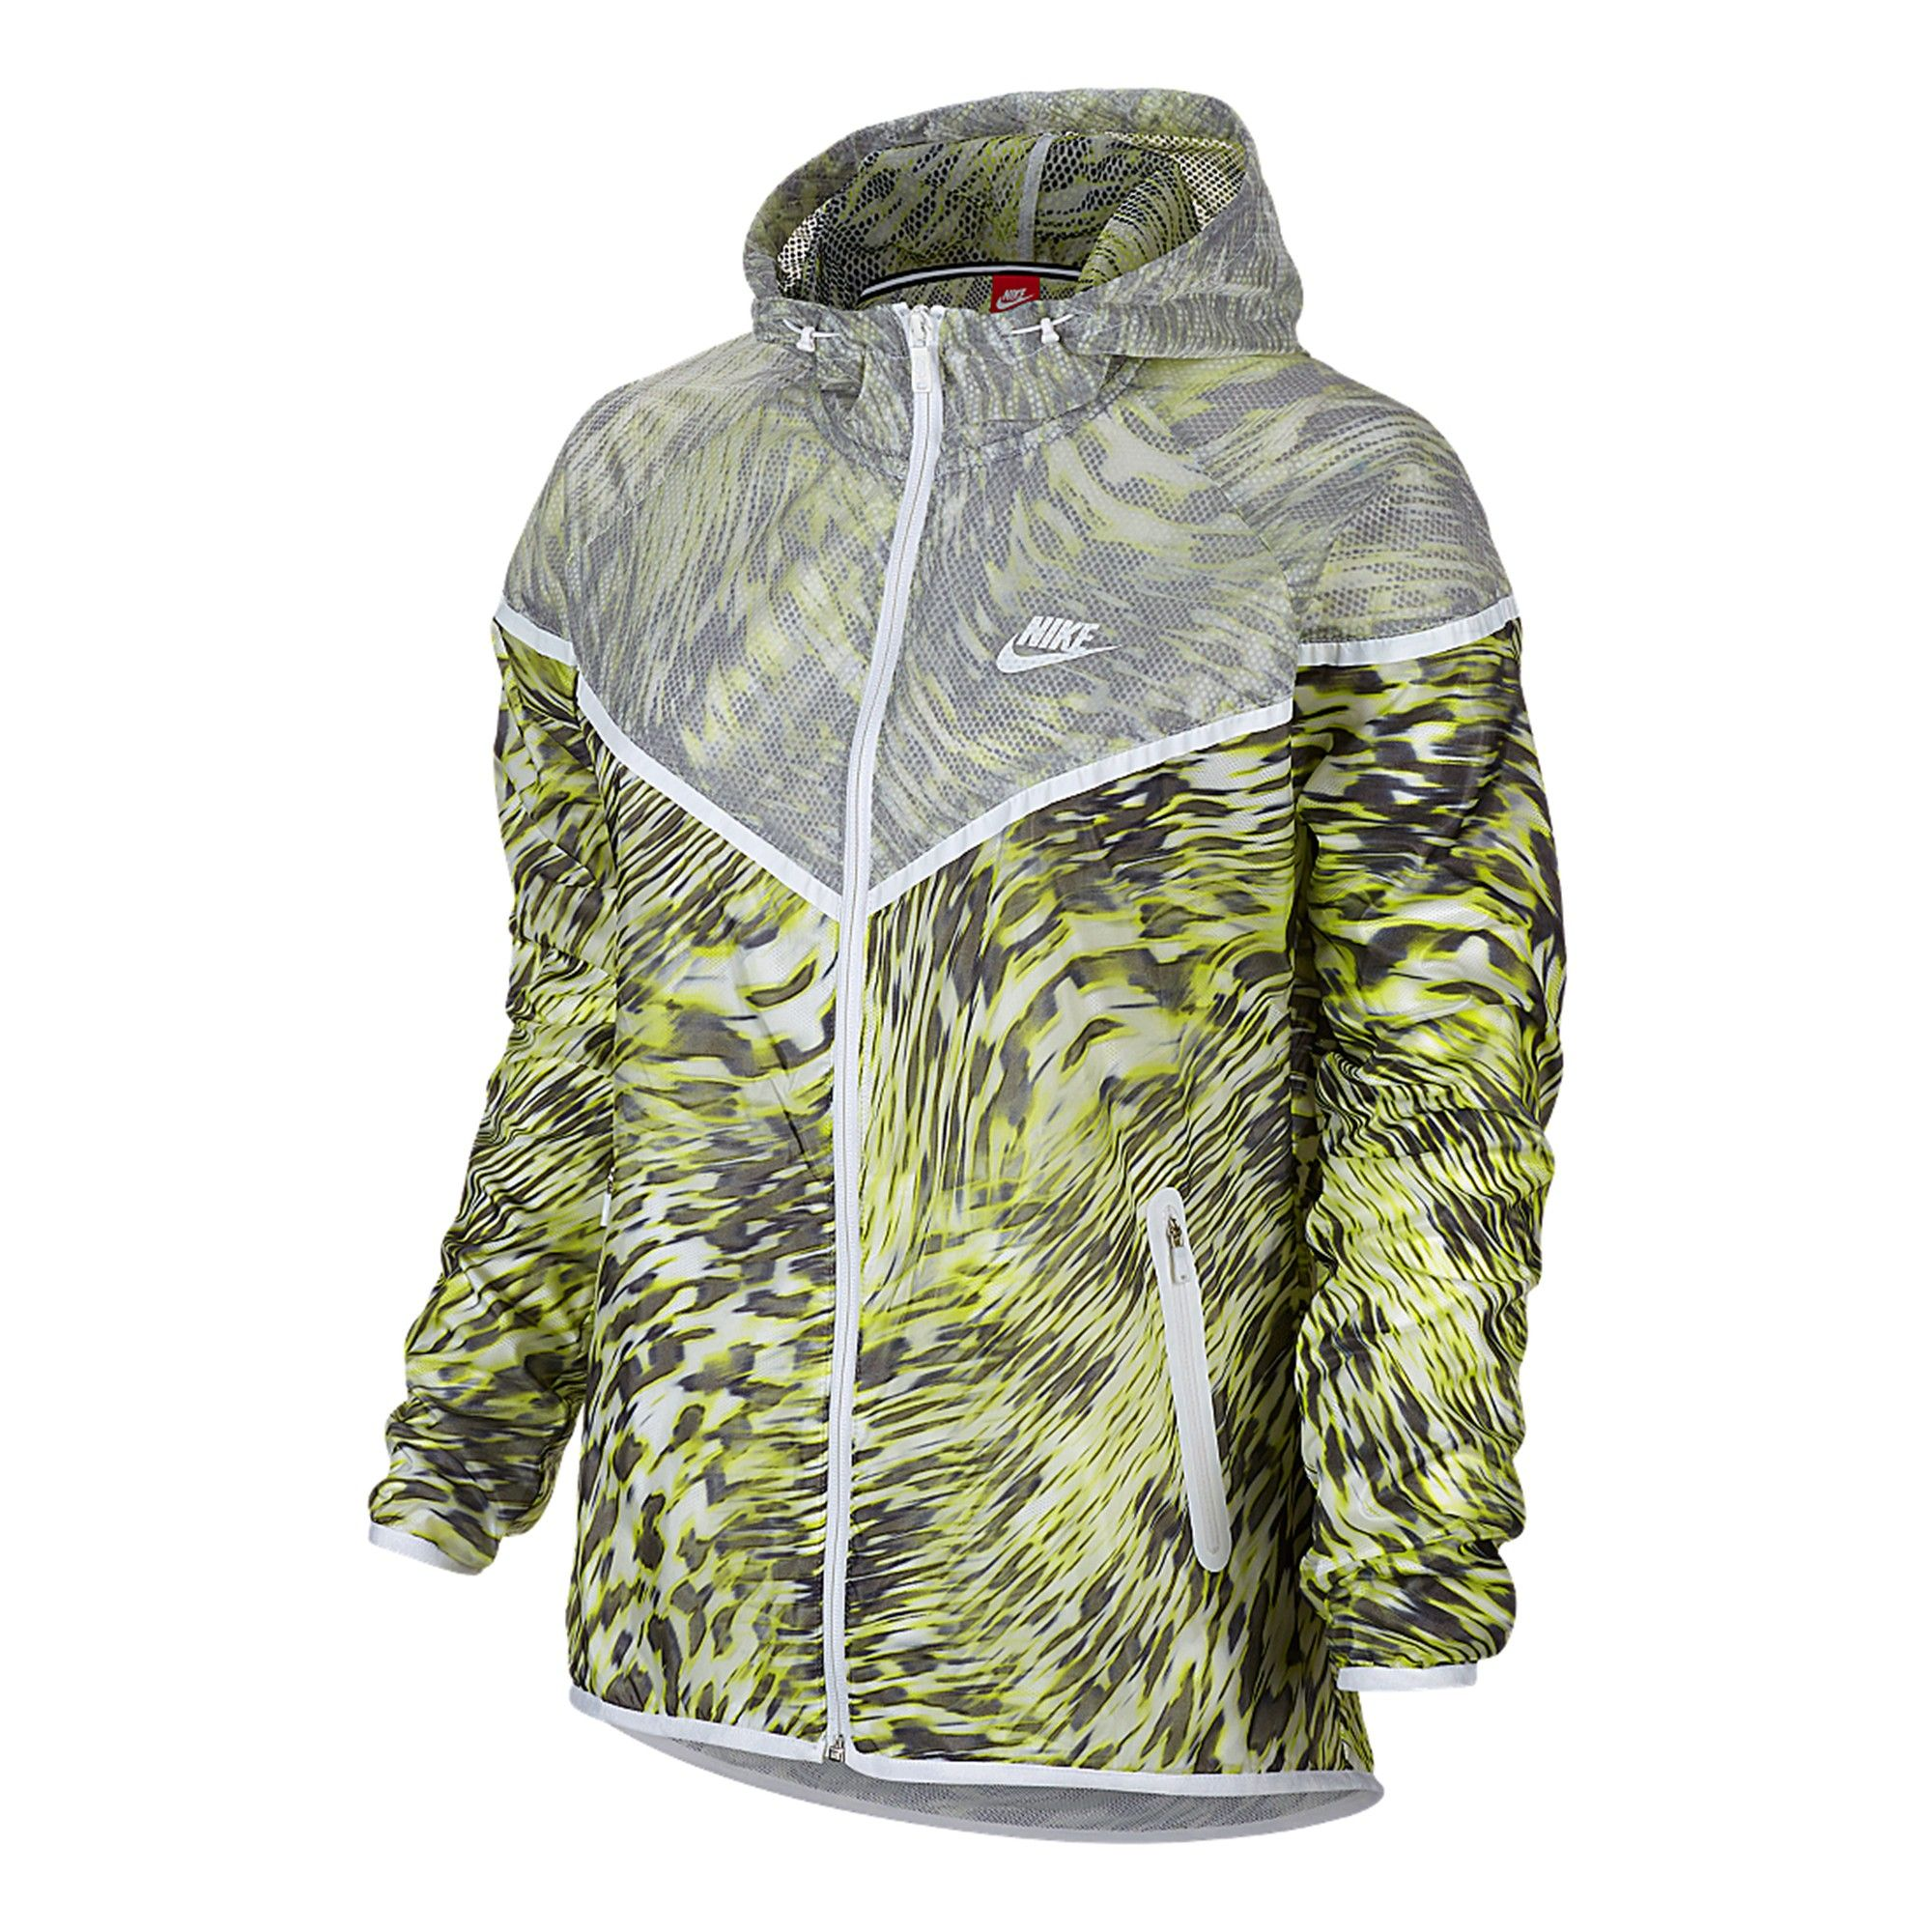 reasonably priced best online huge sale Veste Nike Tech Hyperfuse Windrunner - 645017-702 - Pegashoes